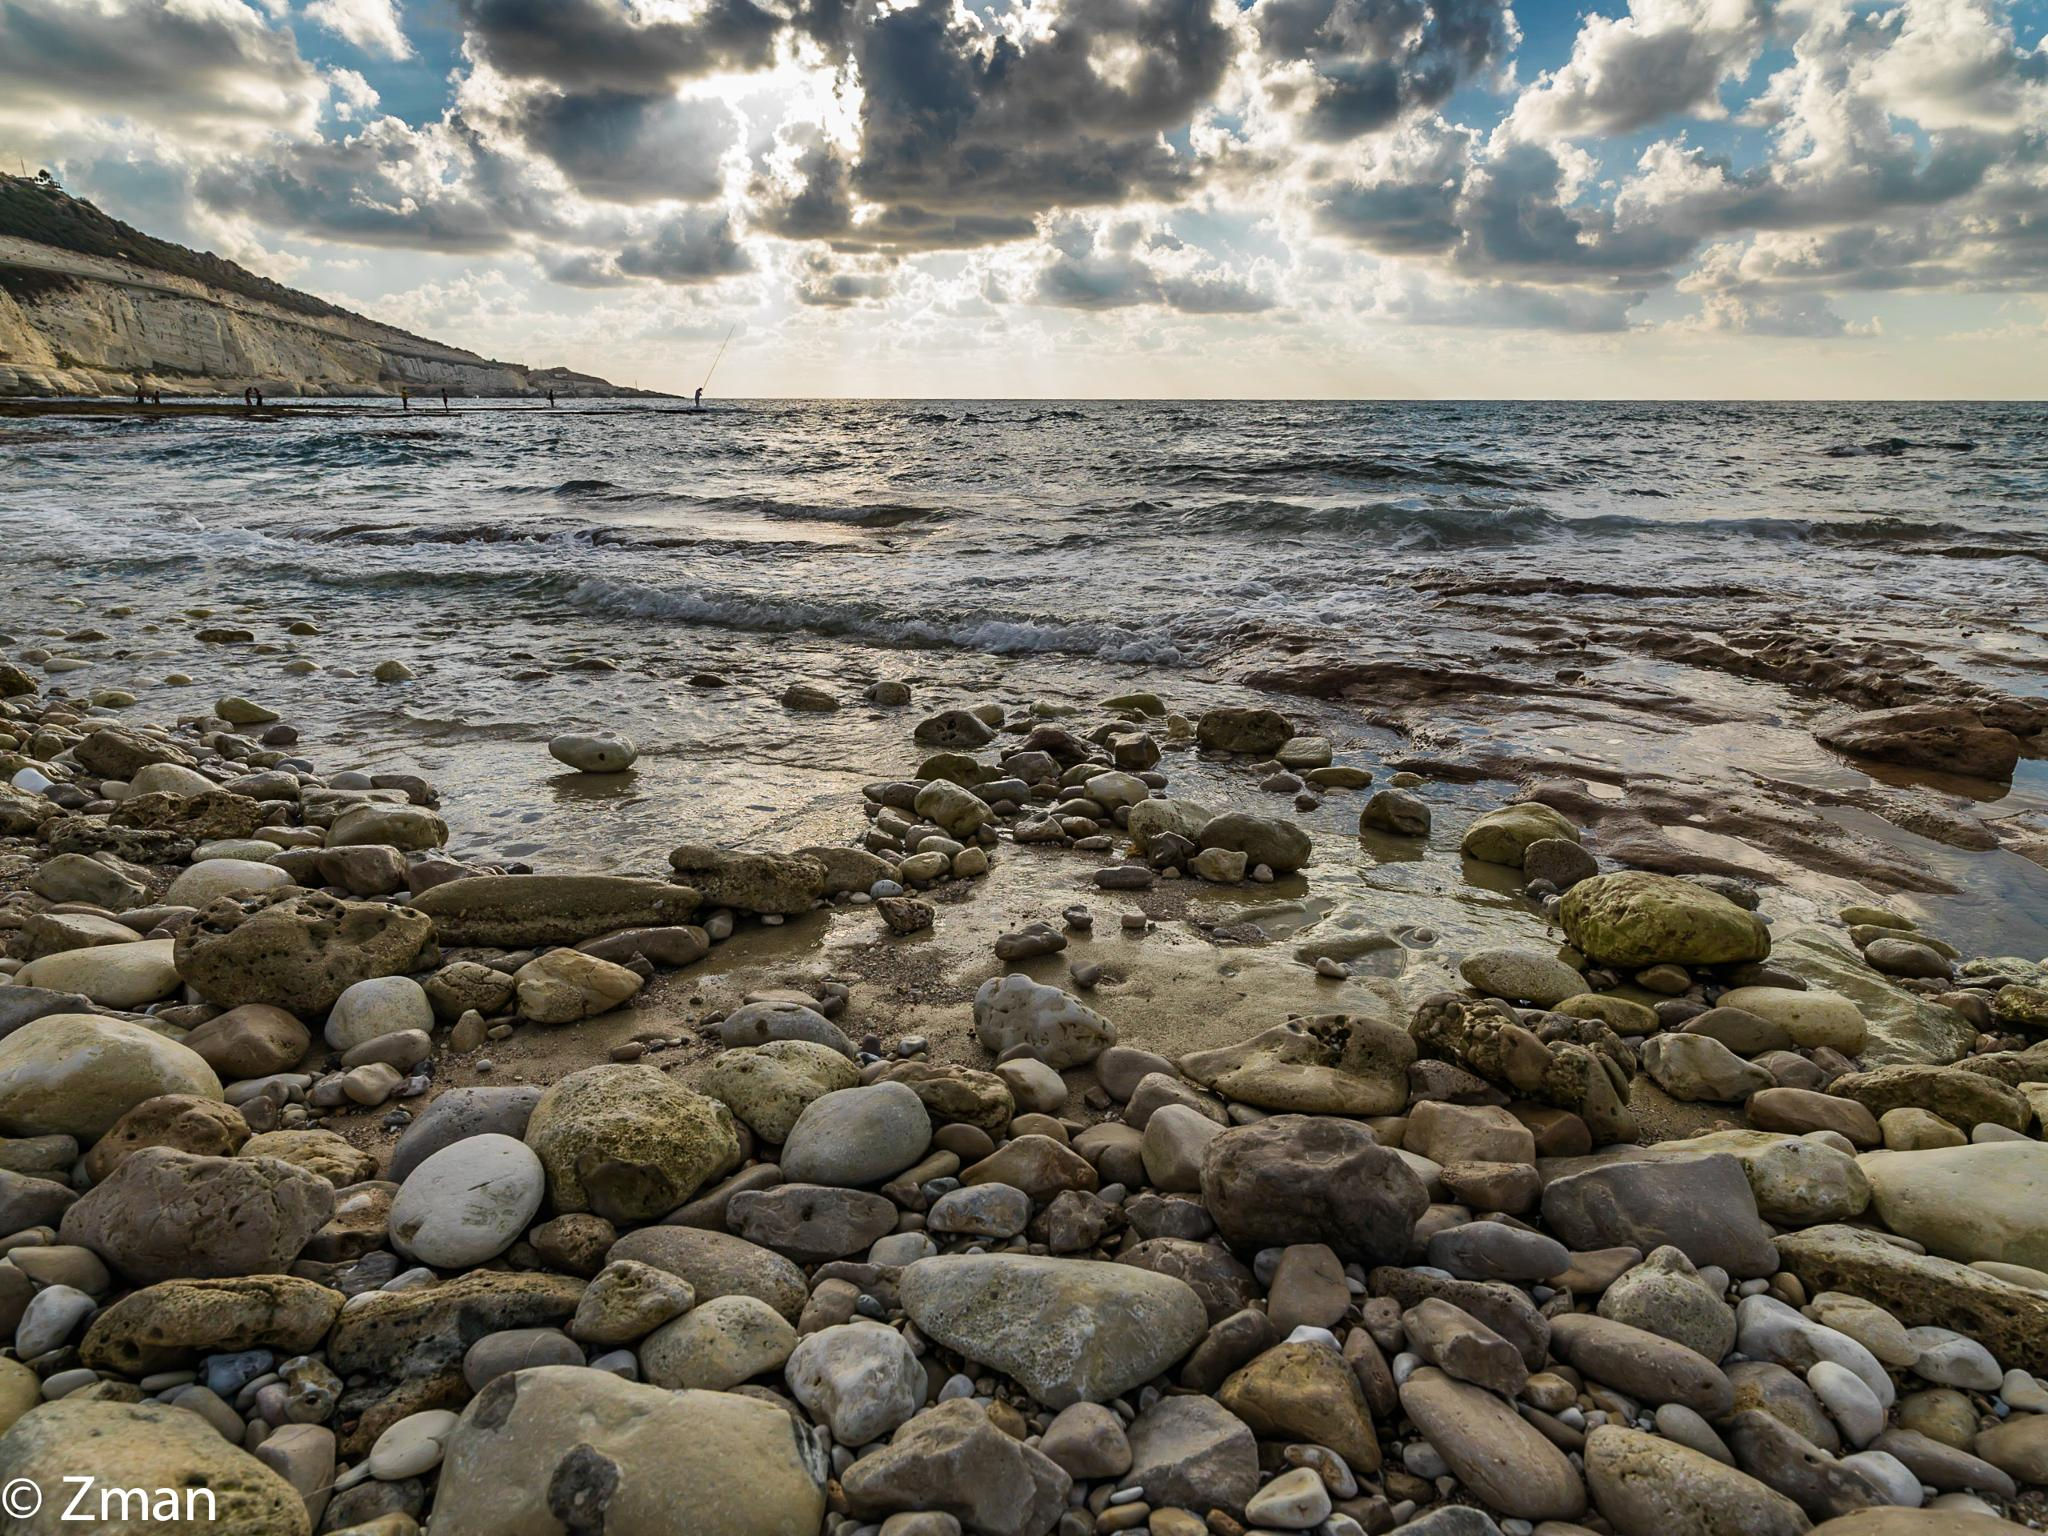 The Pebble Beach At Al Naqoura 04 by muhammad.nasser.963